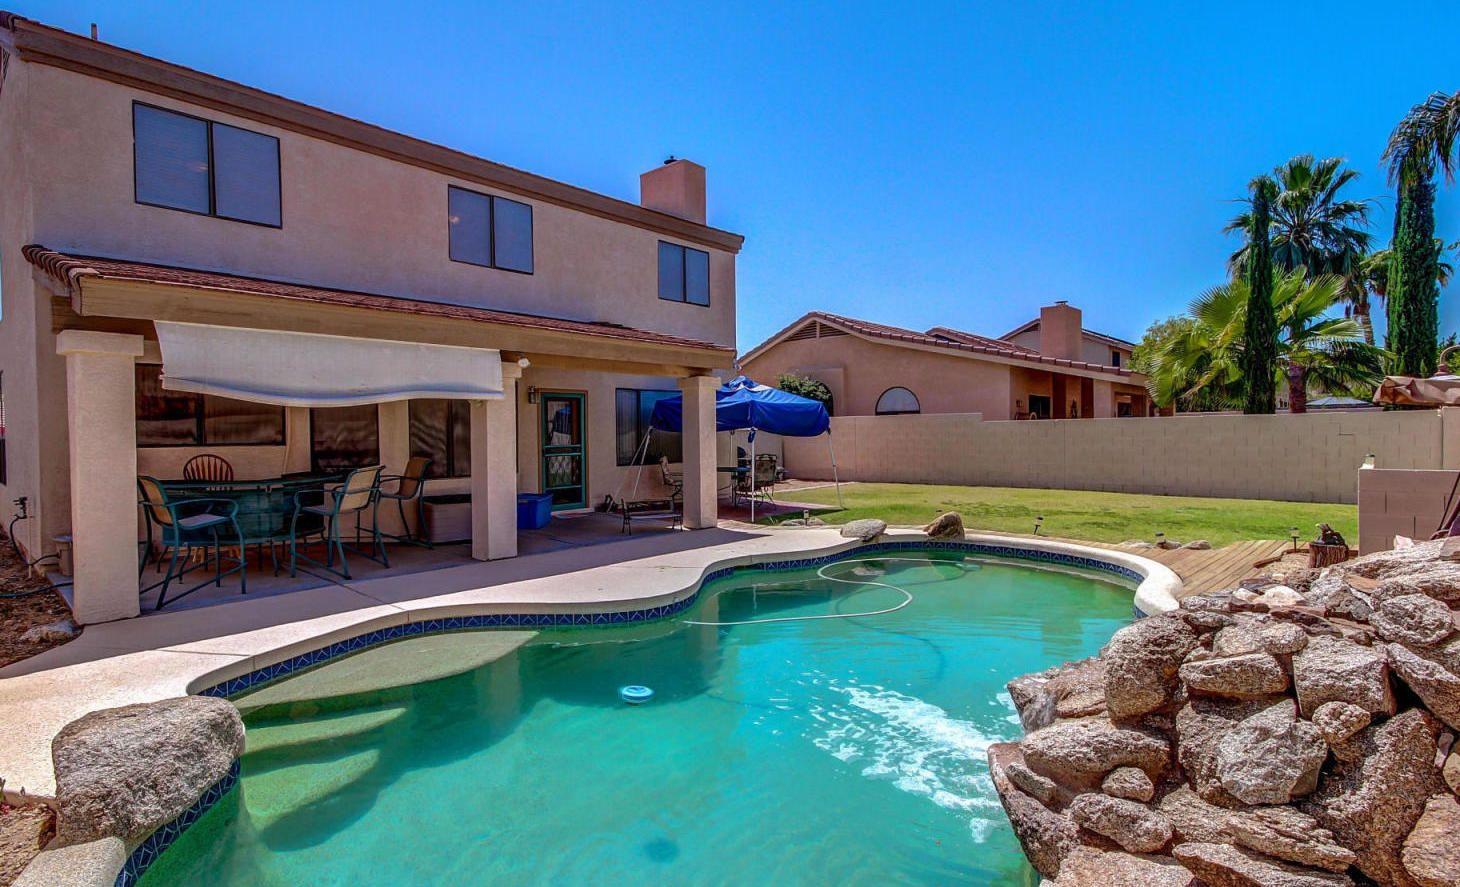 Phoenix 4 Bedroom Homes With Pools Under 400 000 Phoenix Az Area Real Estate Surprise Arizona Pool Houses Pool Prices Pool